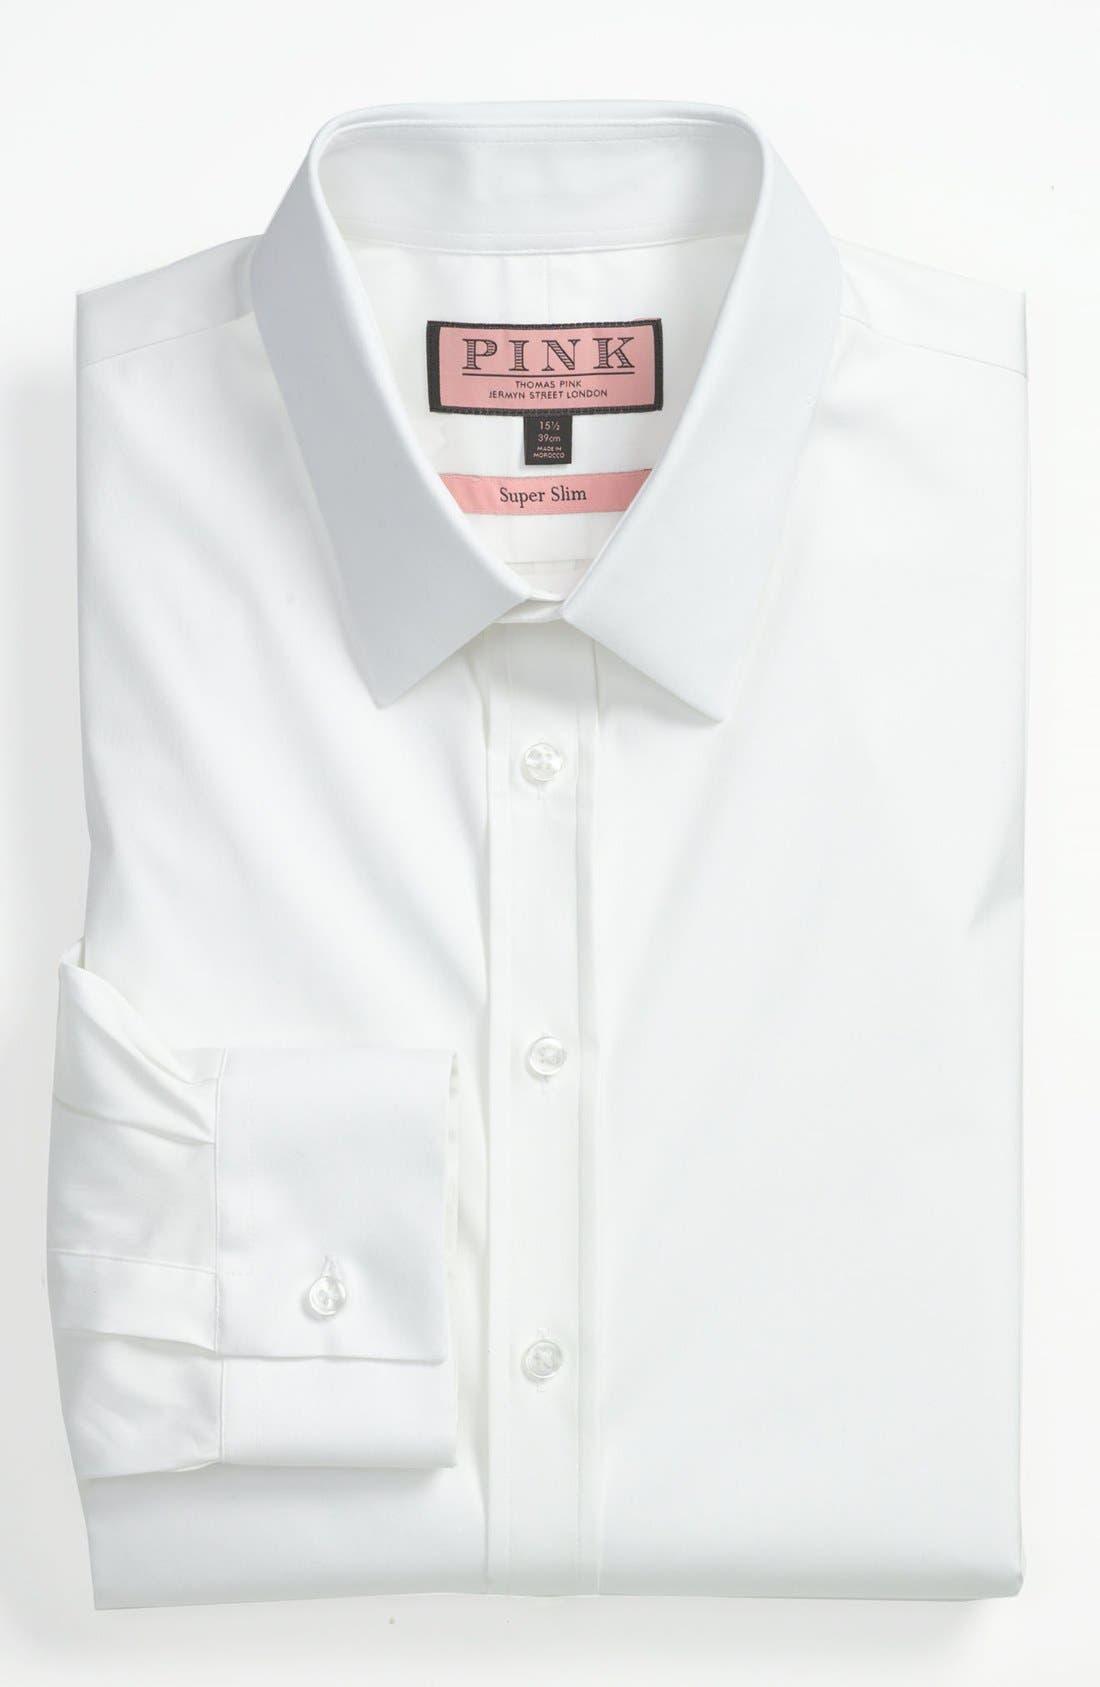 Main Image - Thomas Pink 'Freddie' Solid Cotton Stretch Super Slim Fit Dress Shirt